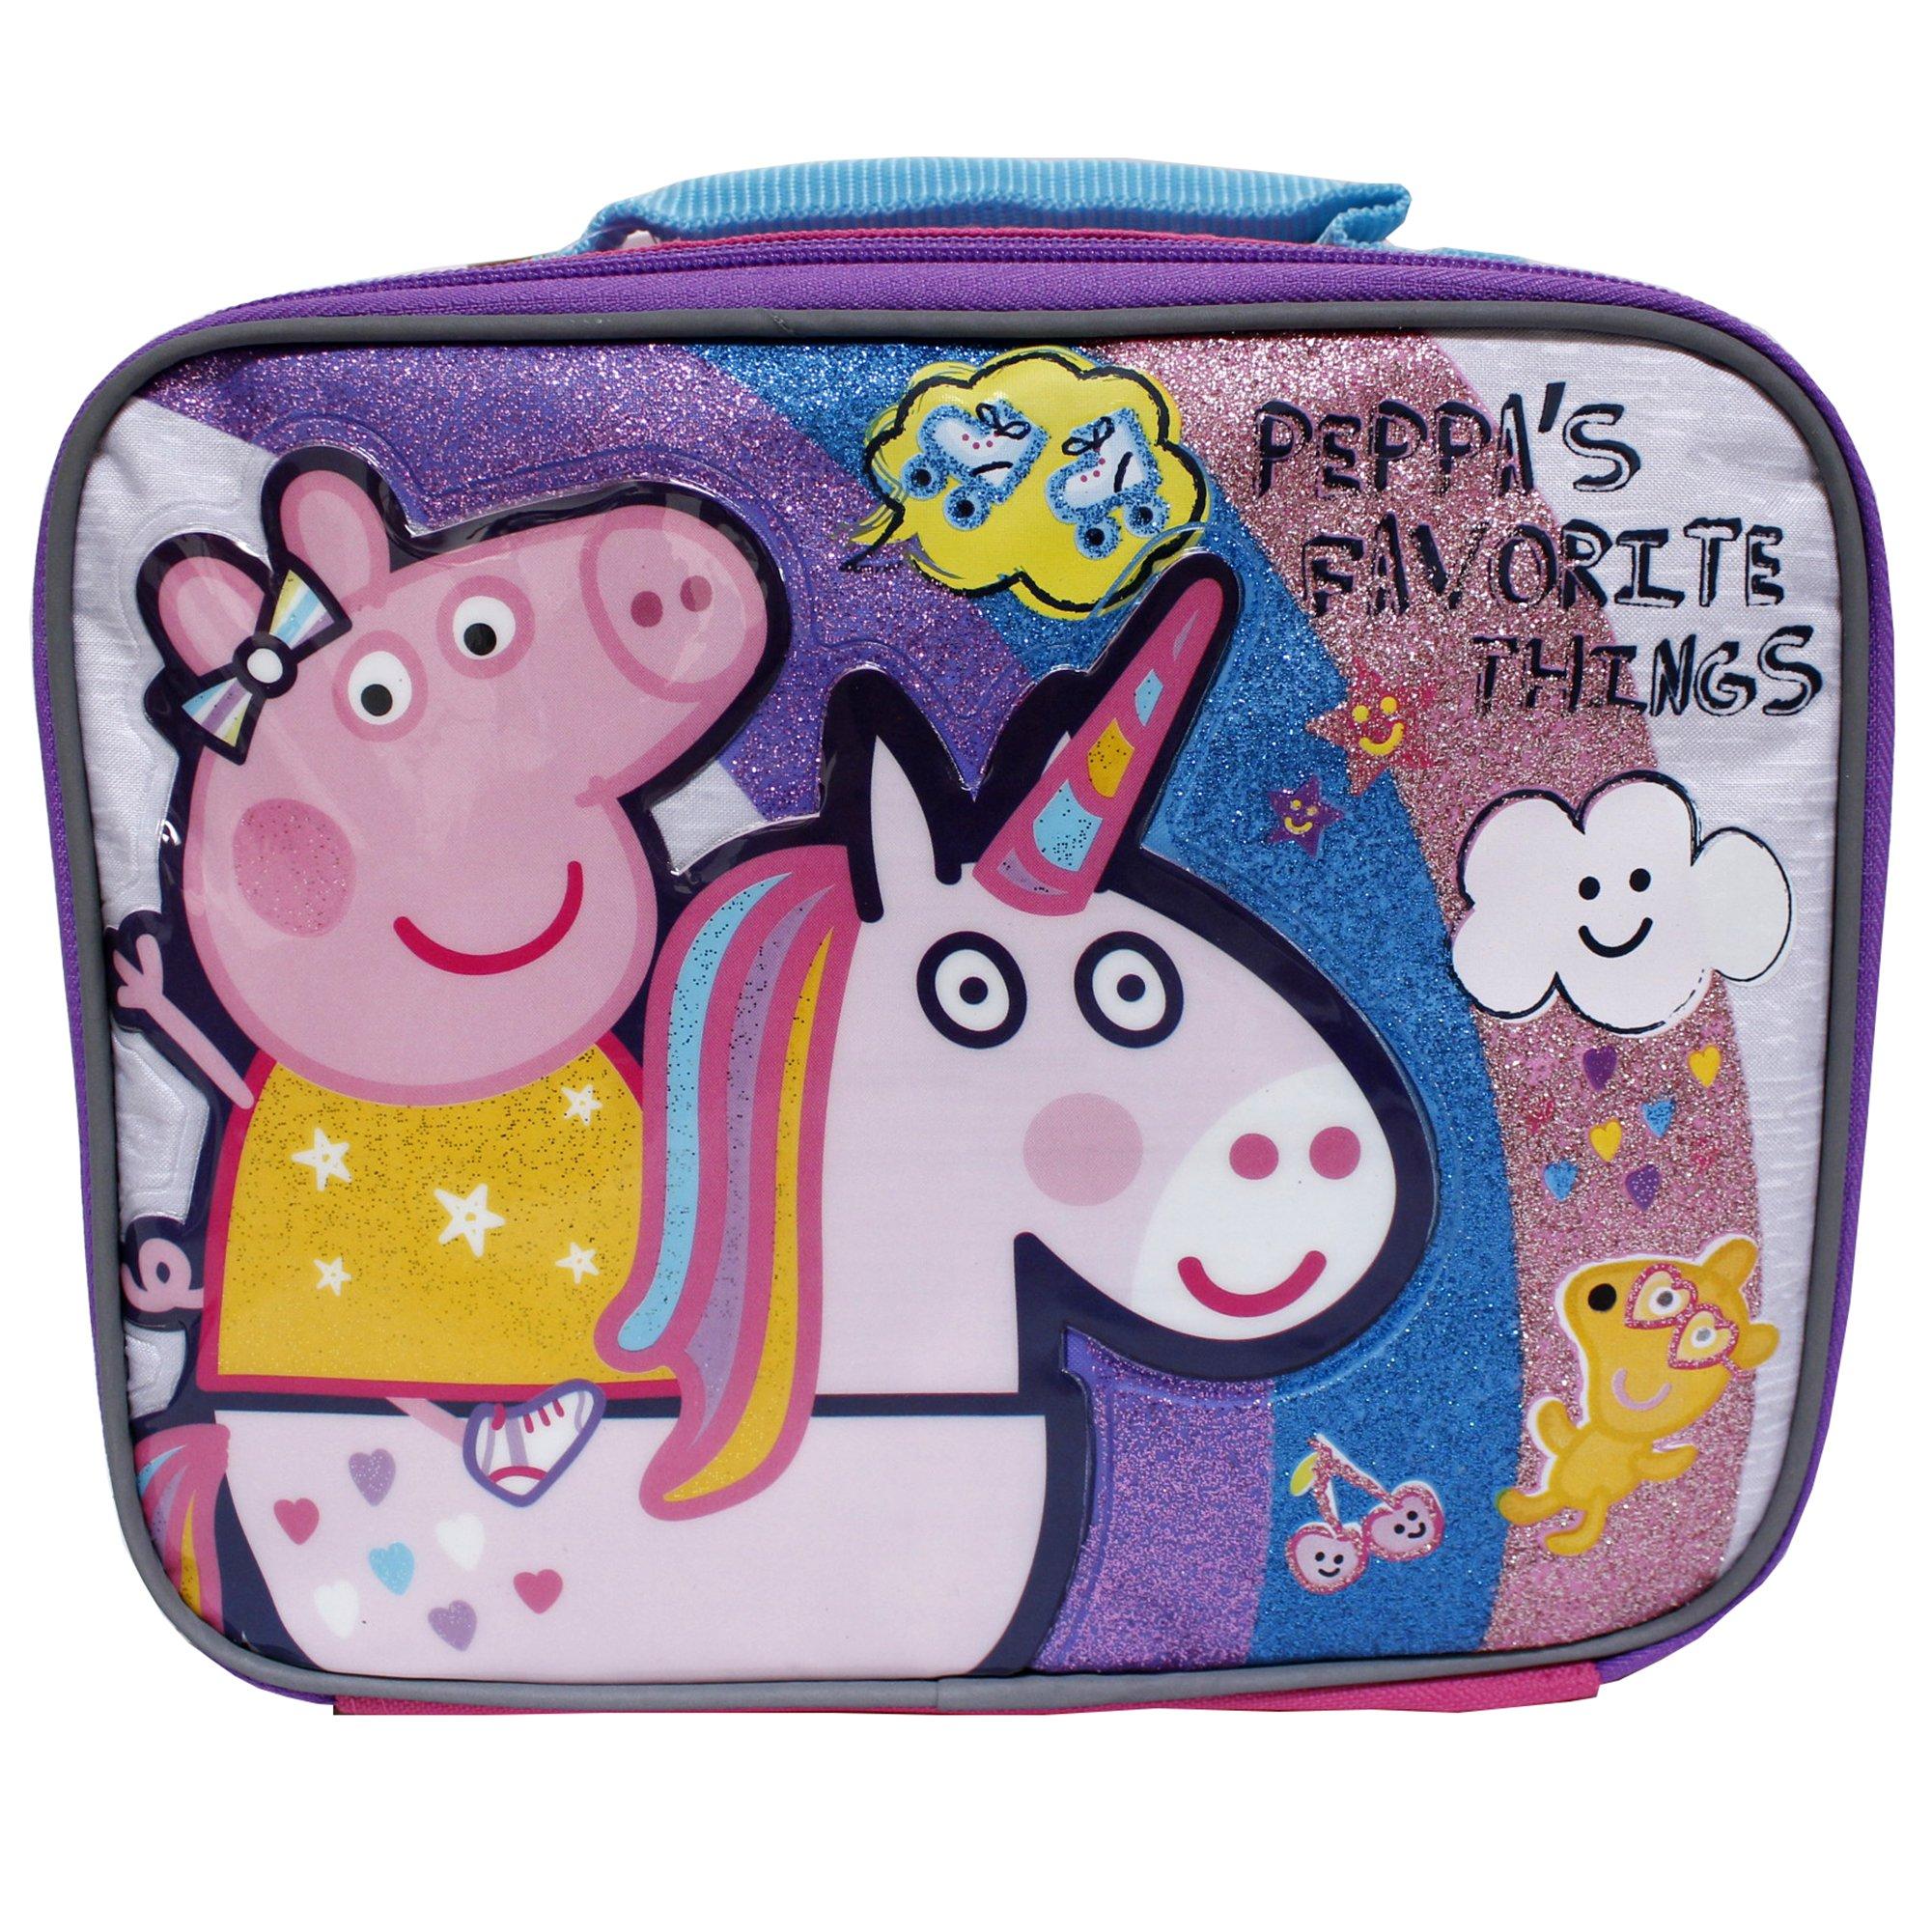 Peppa Pig Pink Peppa's Favorite Things Girls' Insulated School Lunch Bag